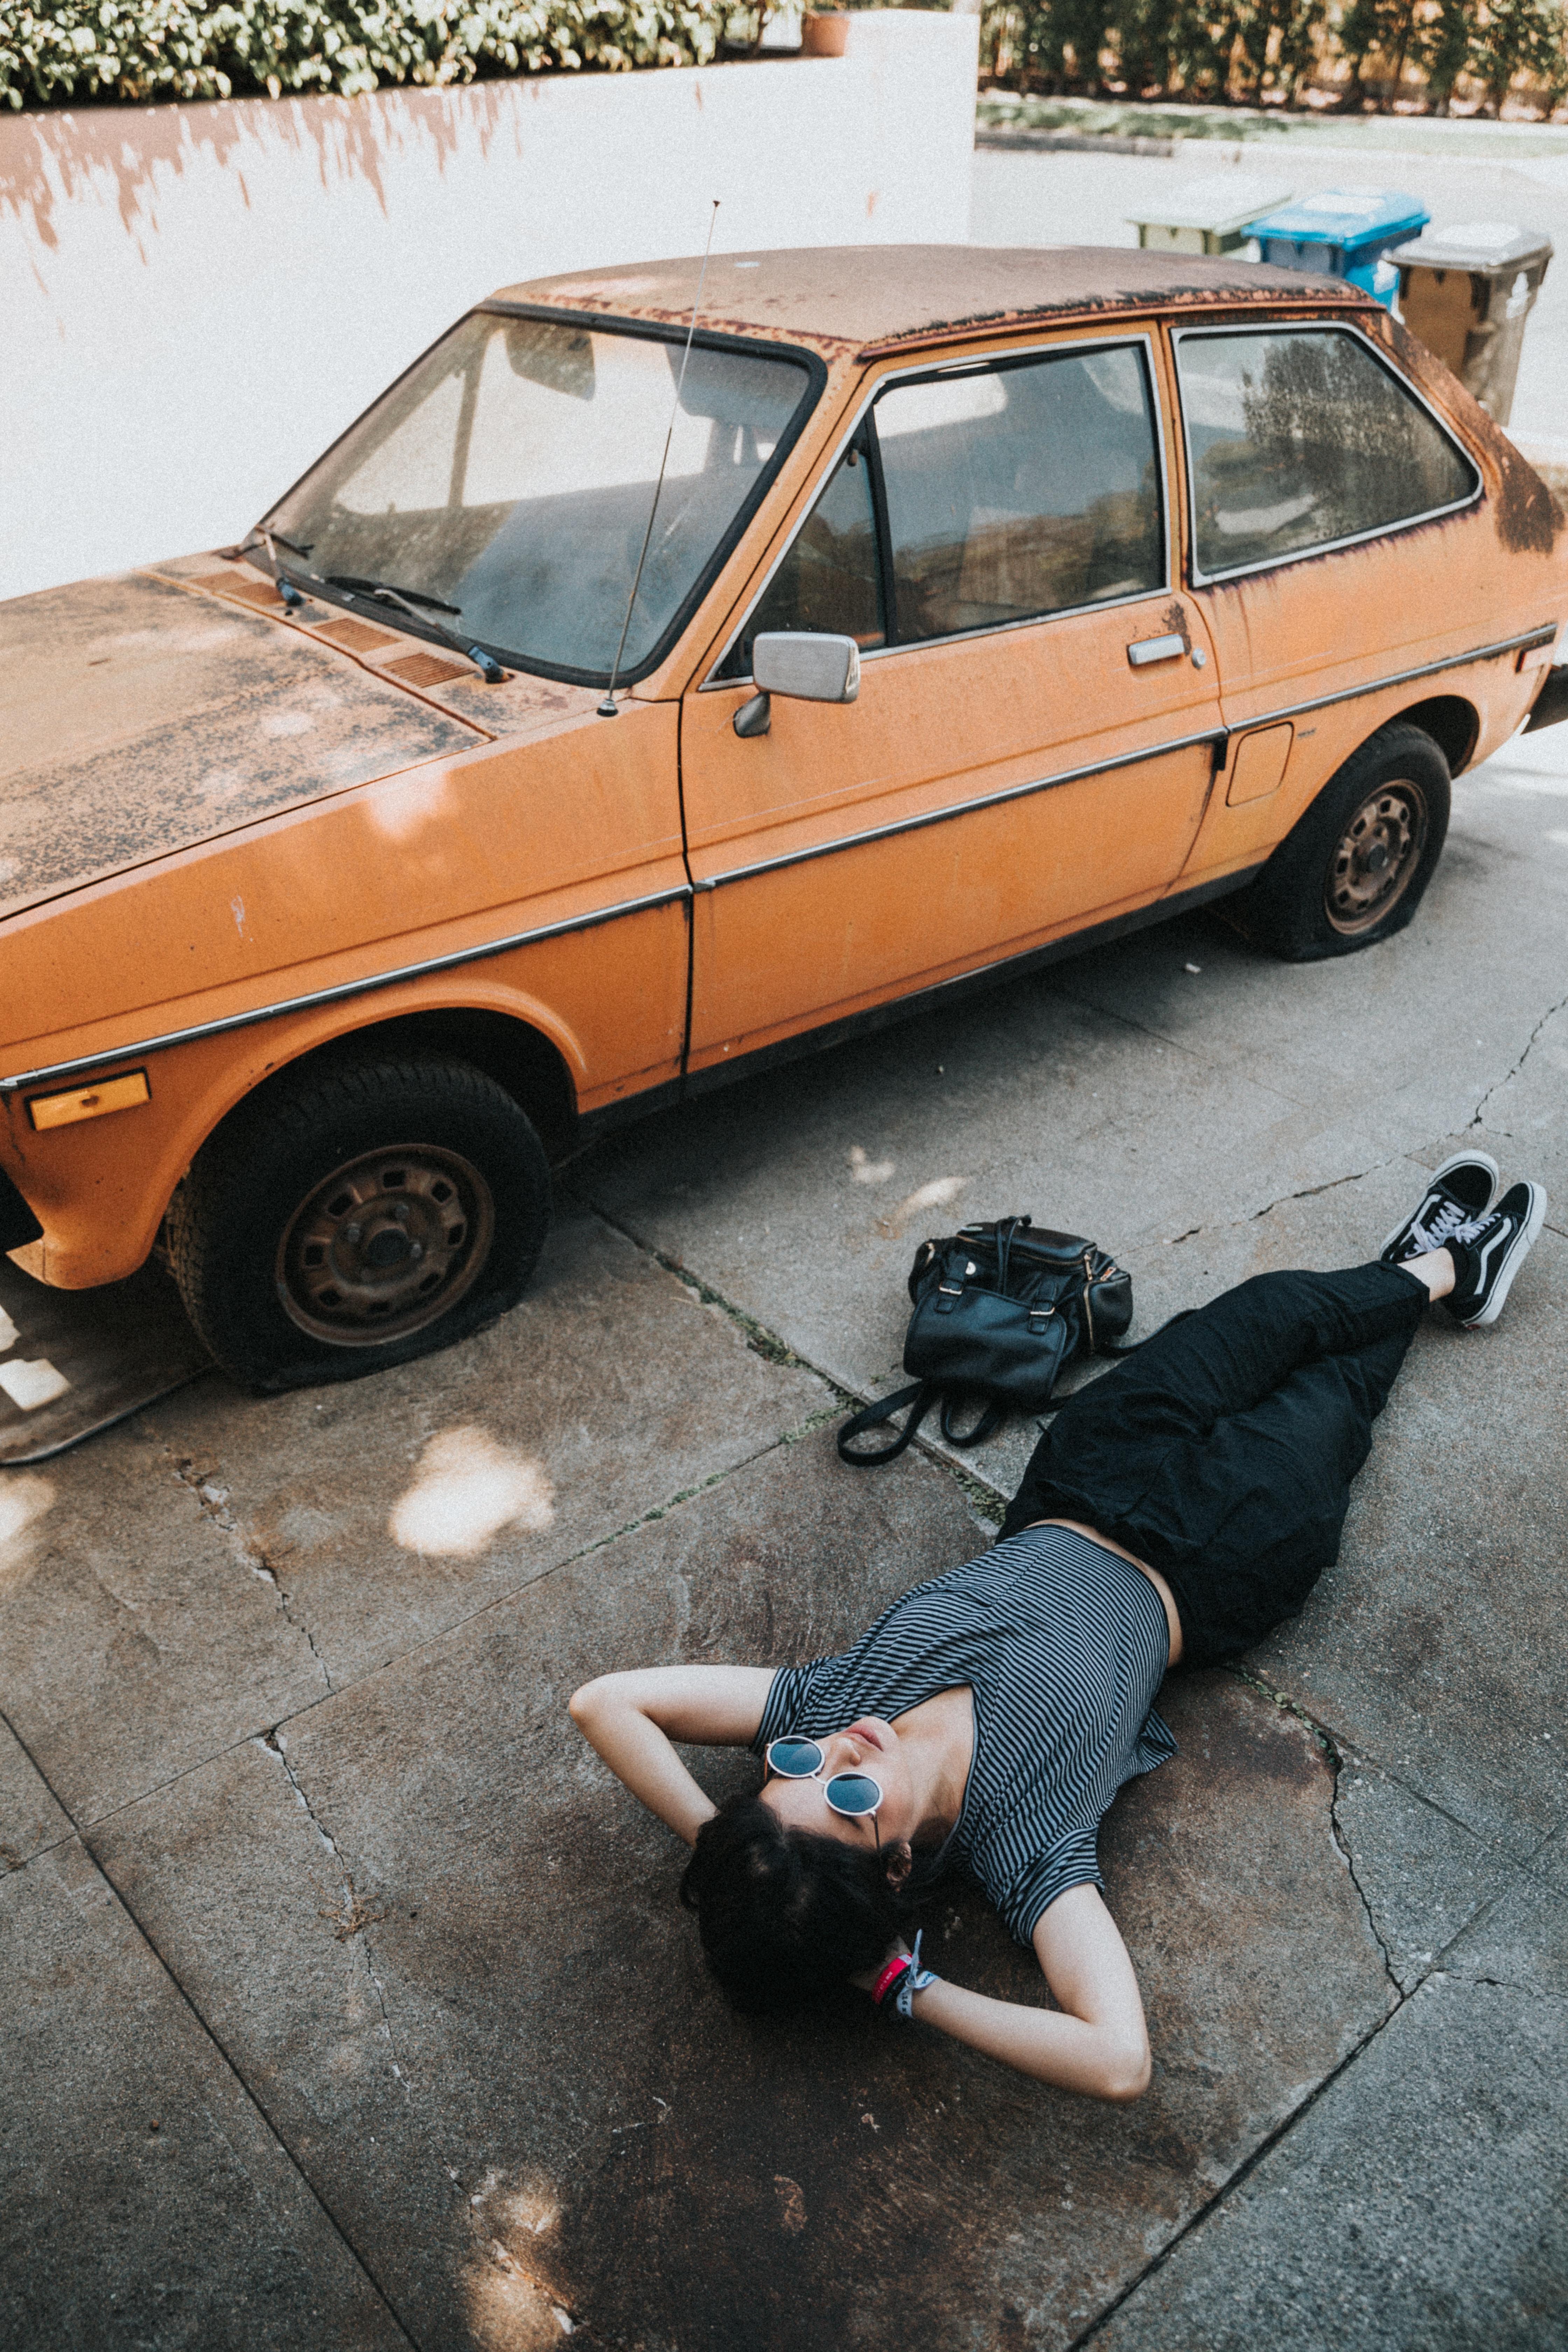 A woman lying down next to an old orange car.